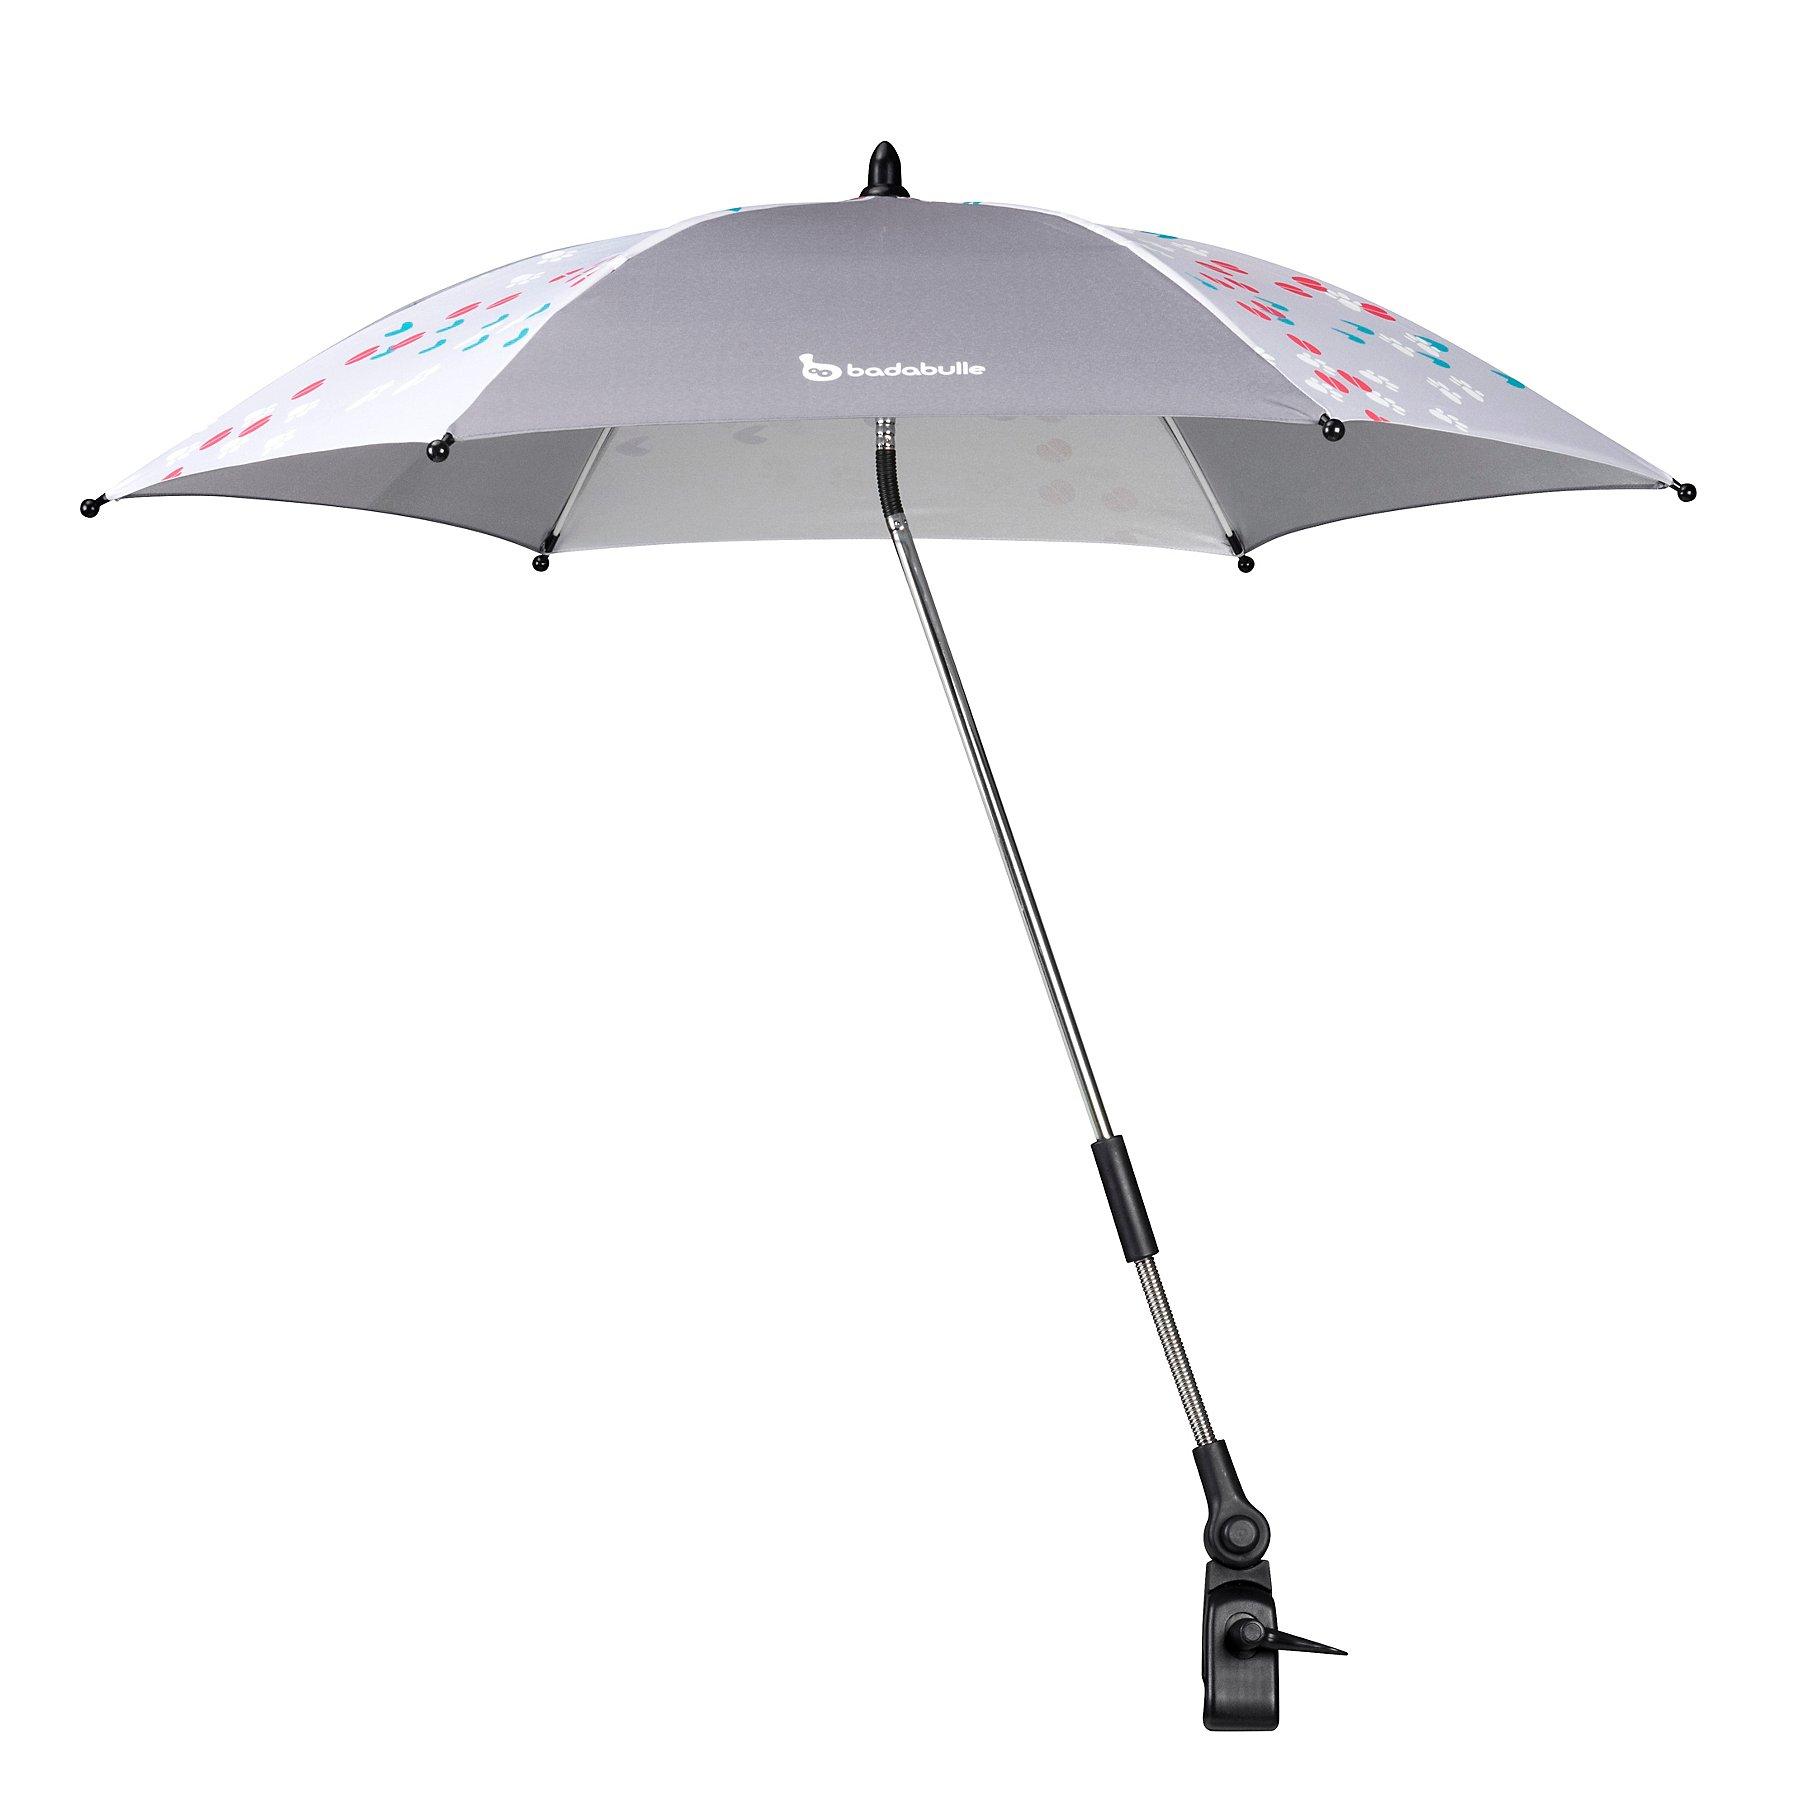 Badabulle Uv Parasol Umbrella Grey